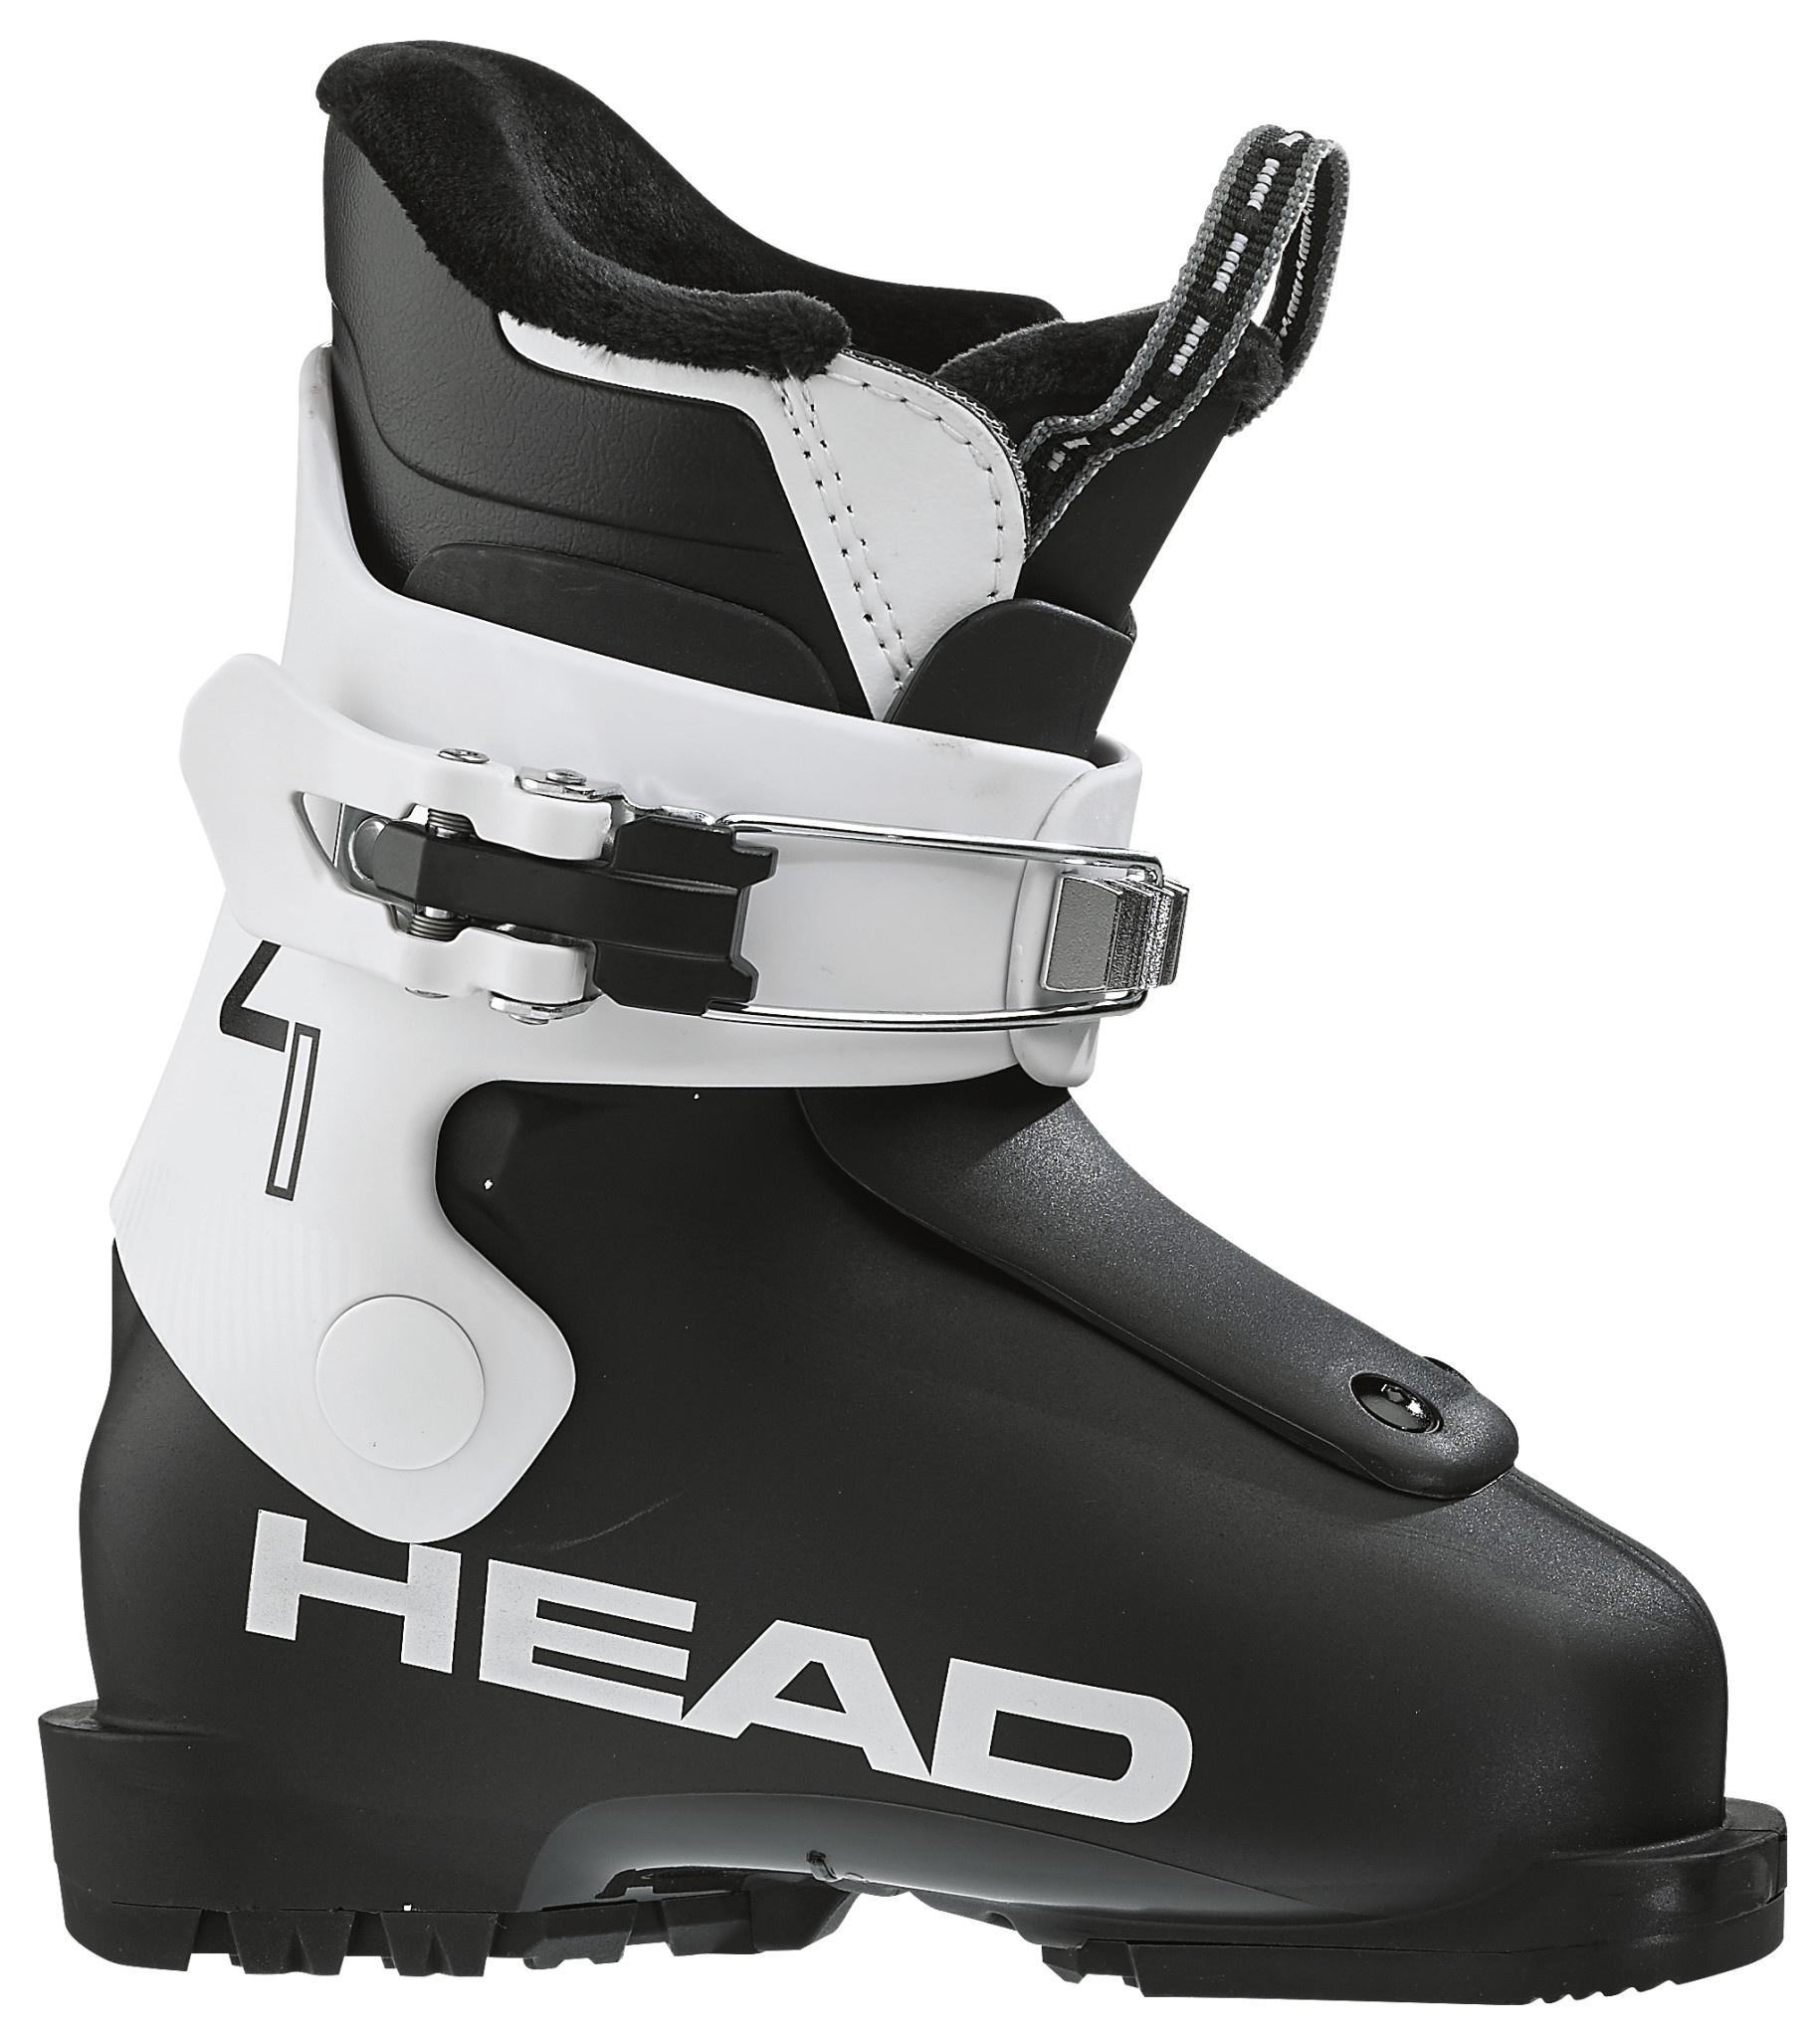 Head Head Youth Z1 Ski Boot